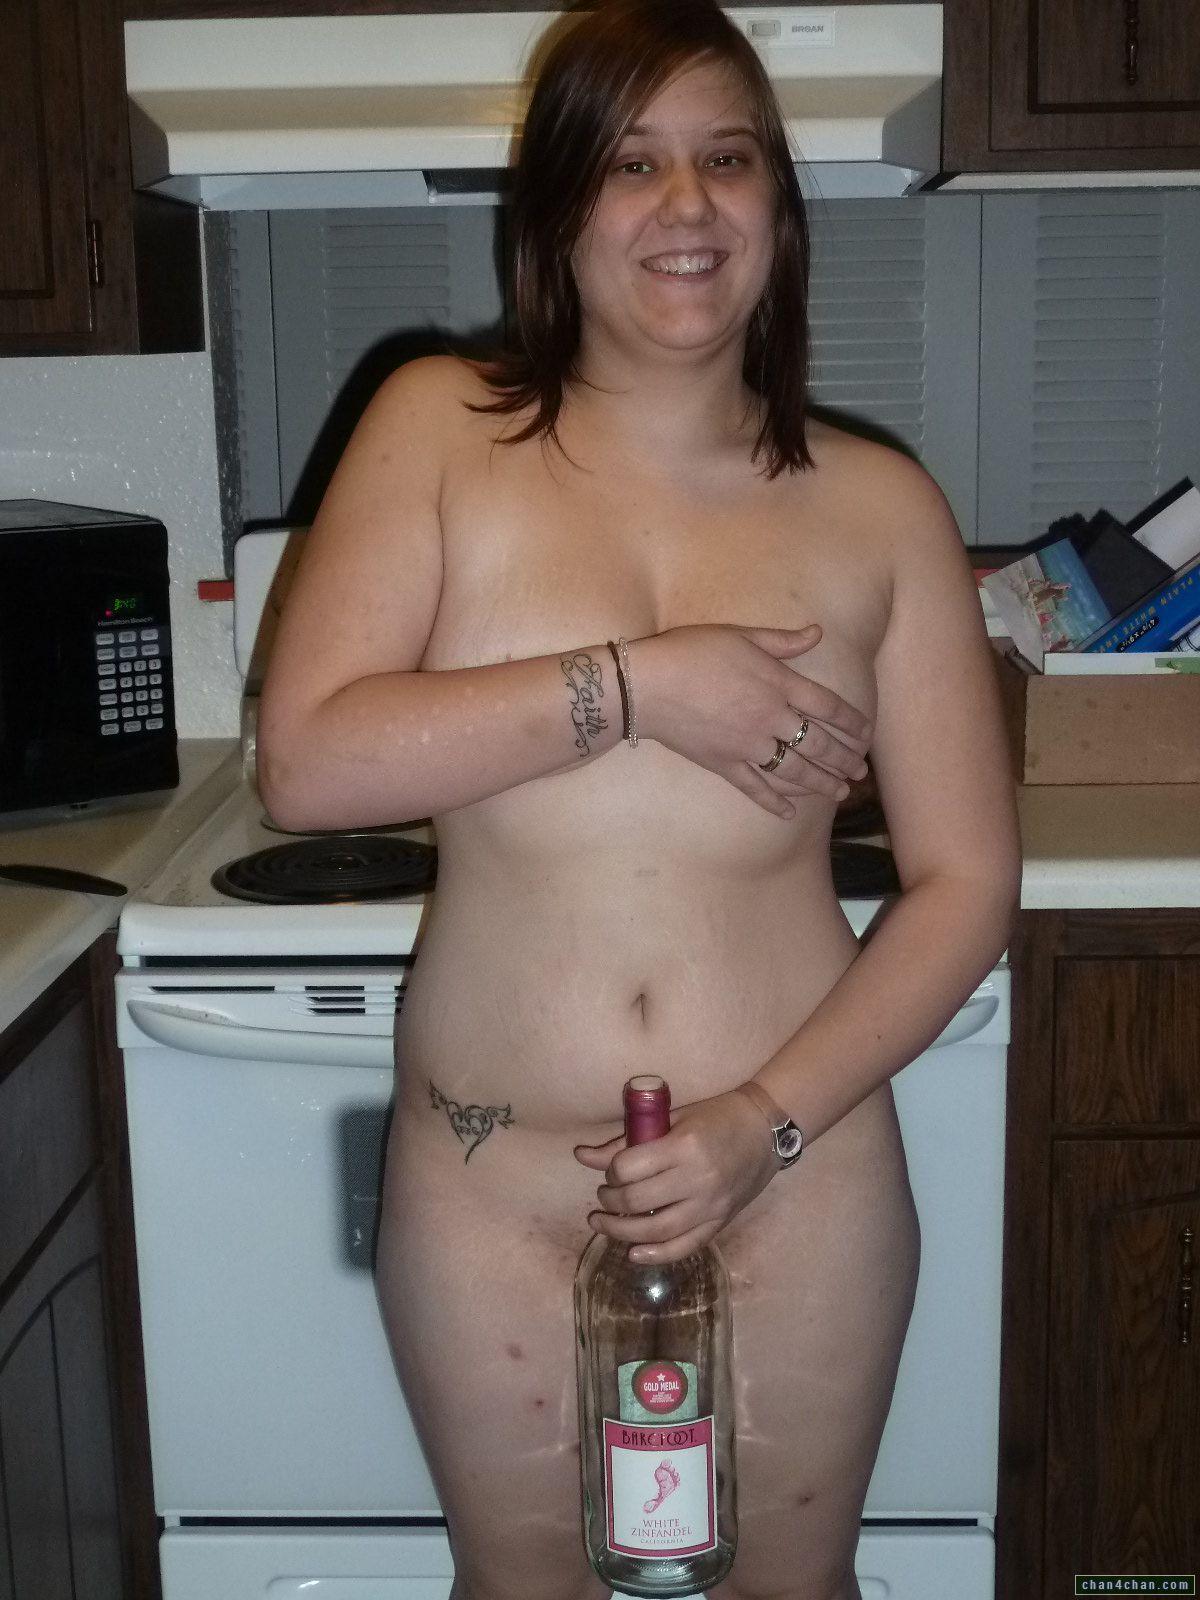 Carmen garcia in the nude